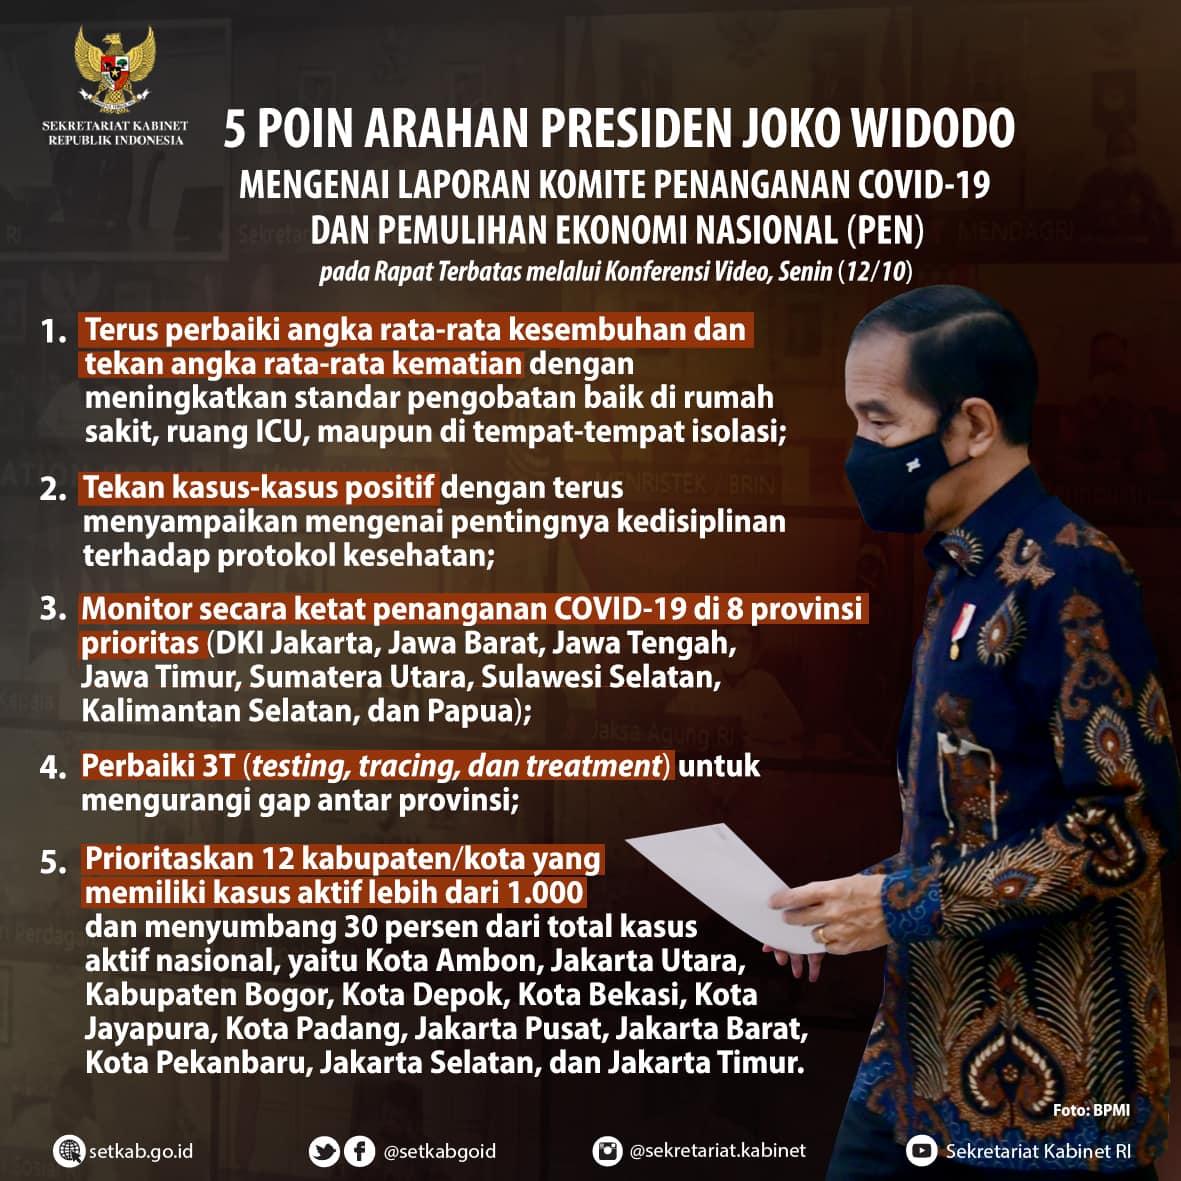 Arahan Presiden Joko Widodo pada Rapat Terbatas mengenai Laporan Komite Penanganan Covid-19 dan Pemulihan Ekonomi Nasional, Senin (12/10)